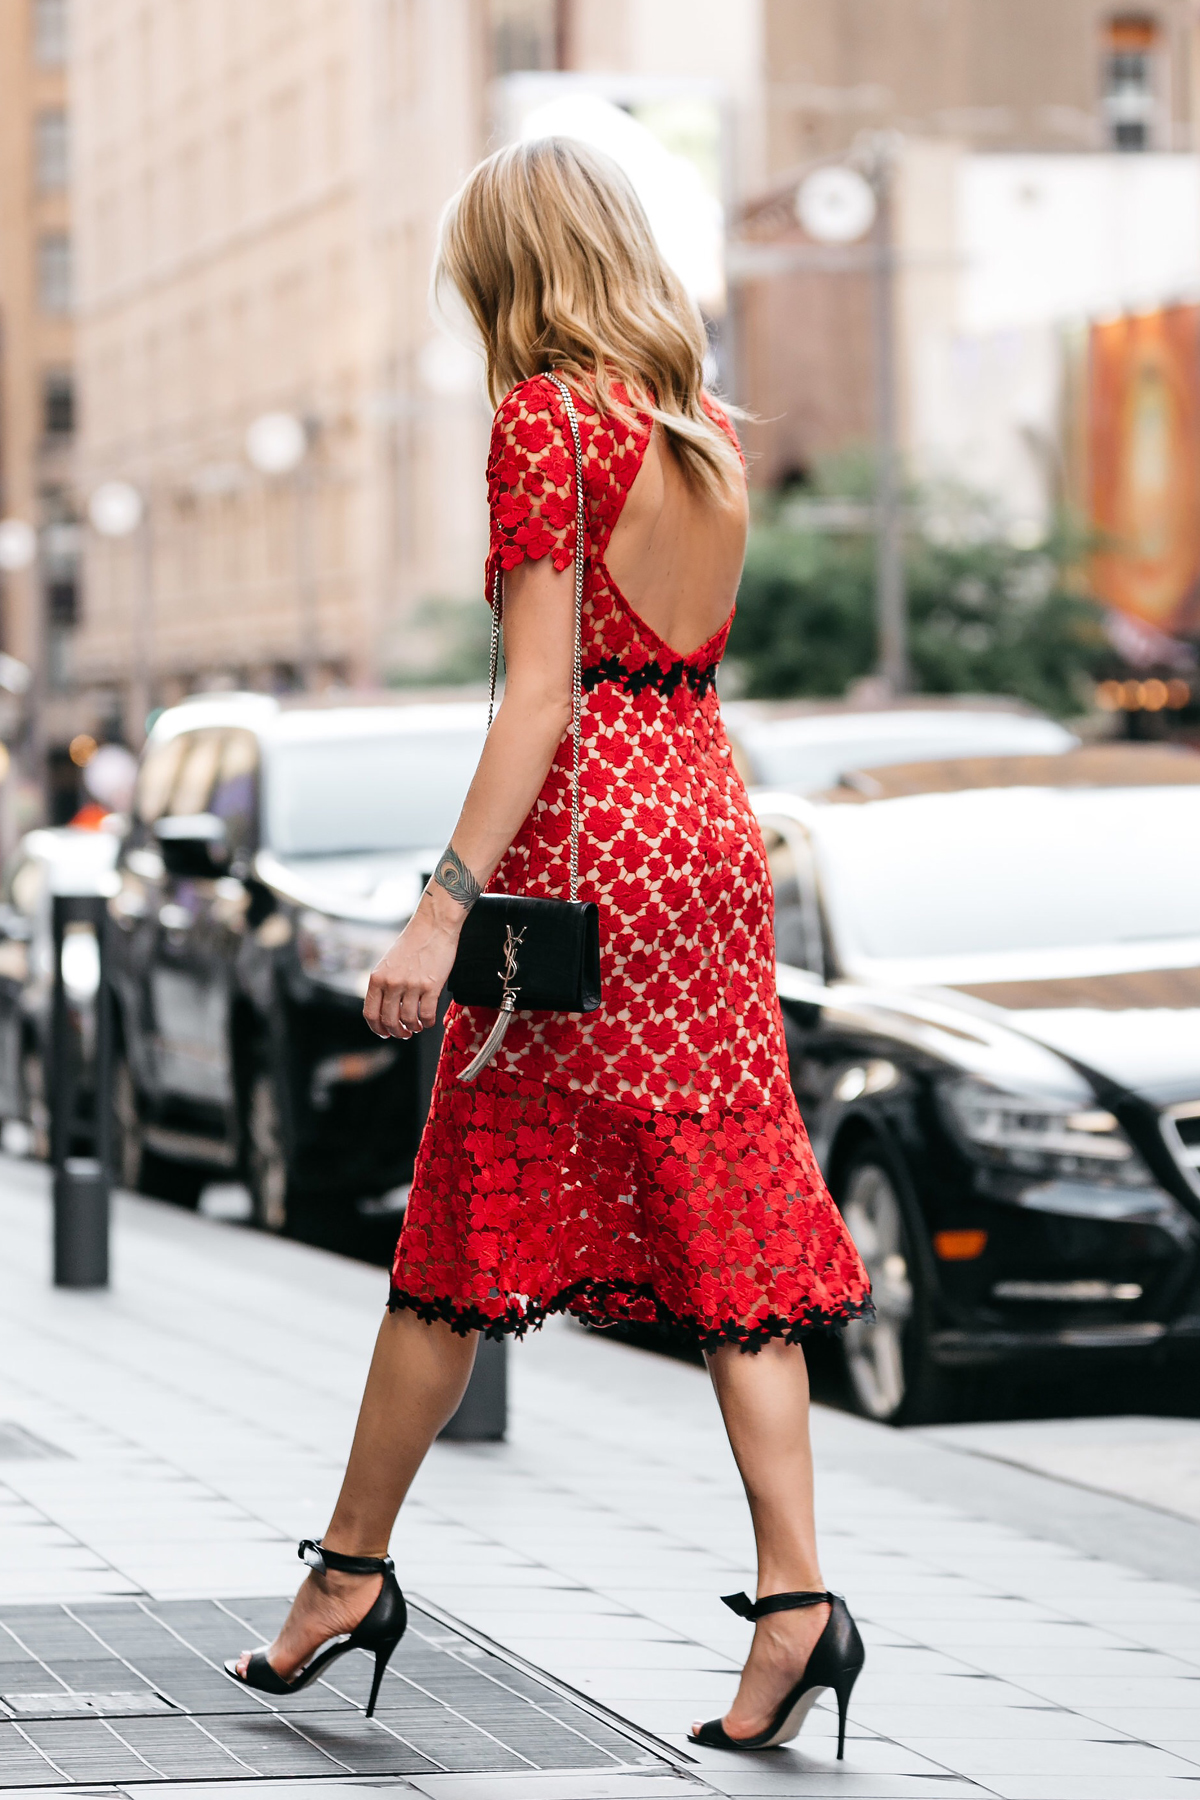 Fashion Jackson, Dallas Blogger, Fashion Blogger, Street Style, Jill Stuart Floral Red Lace Dress, Black Ankle Strap Bow Heels, Saint Laurent Monogram Handbag